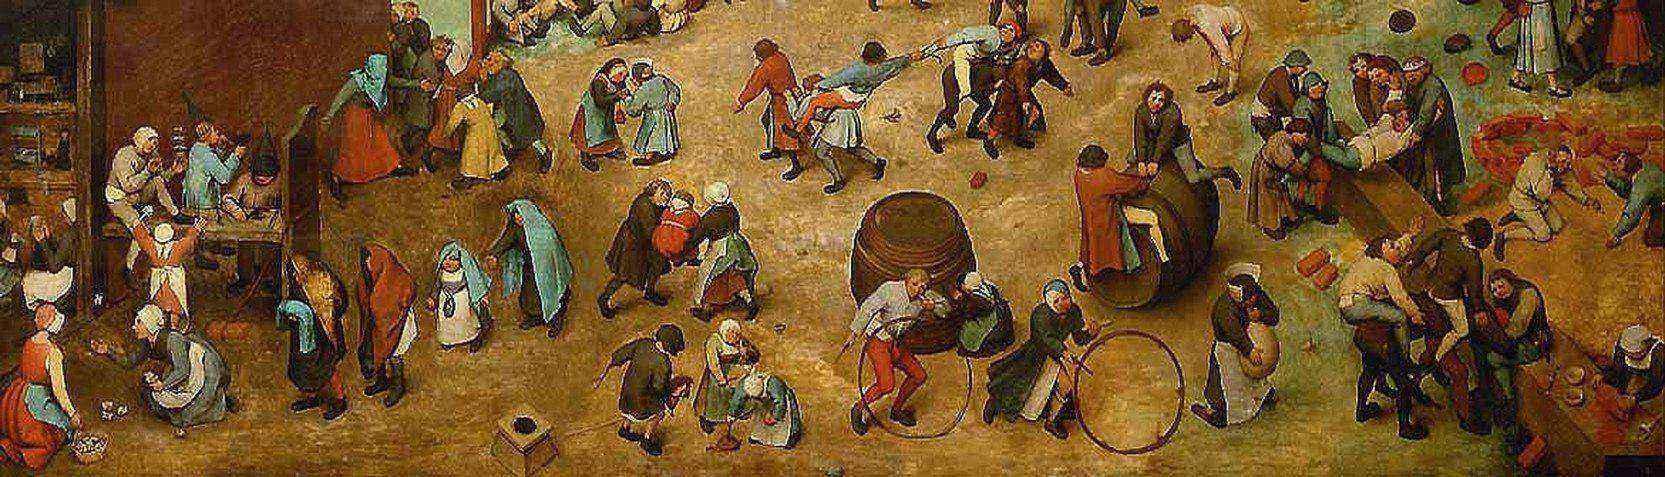 Künstler - Pieter Bruegel der Ältere